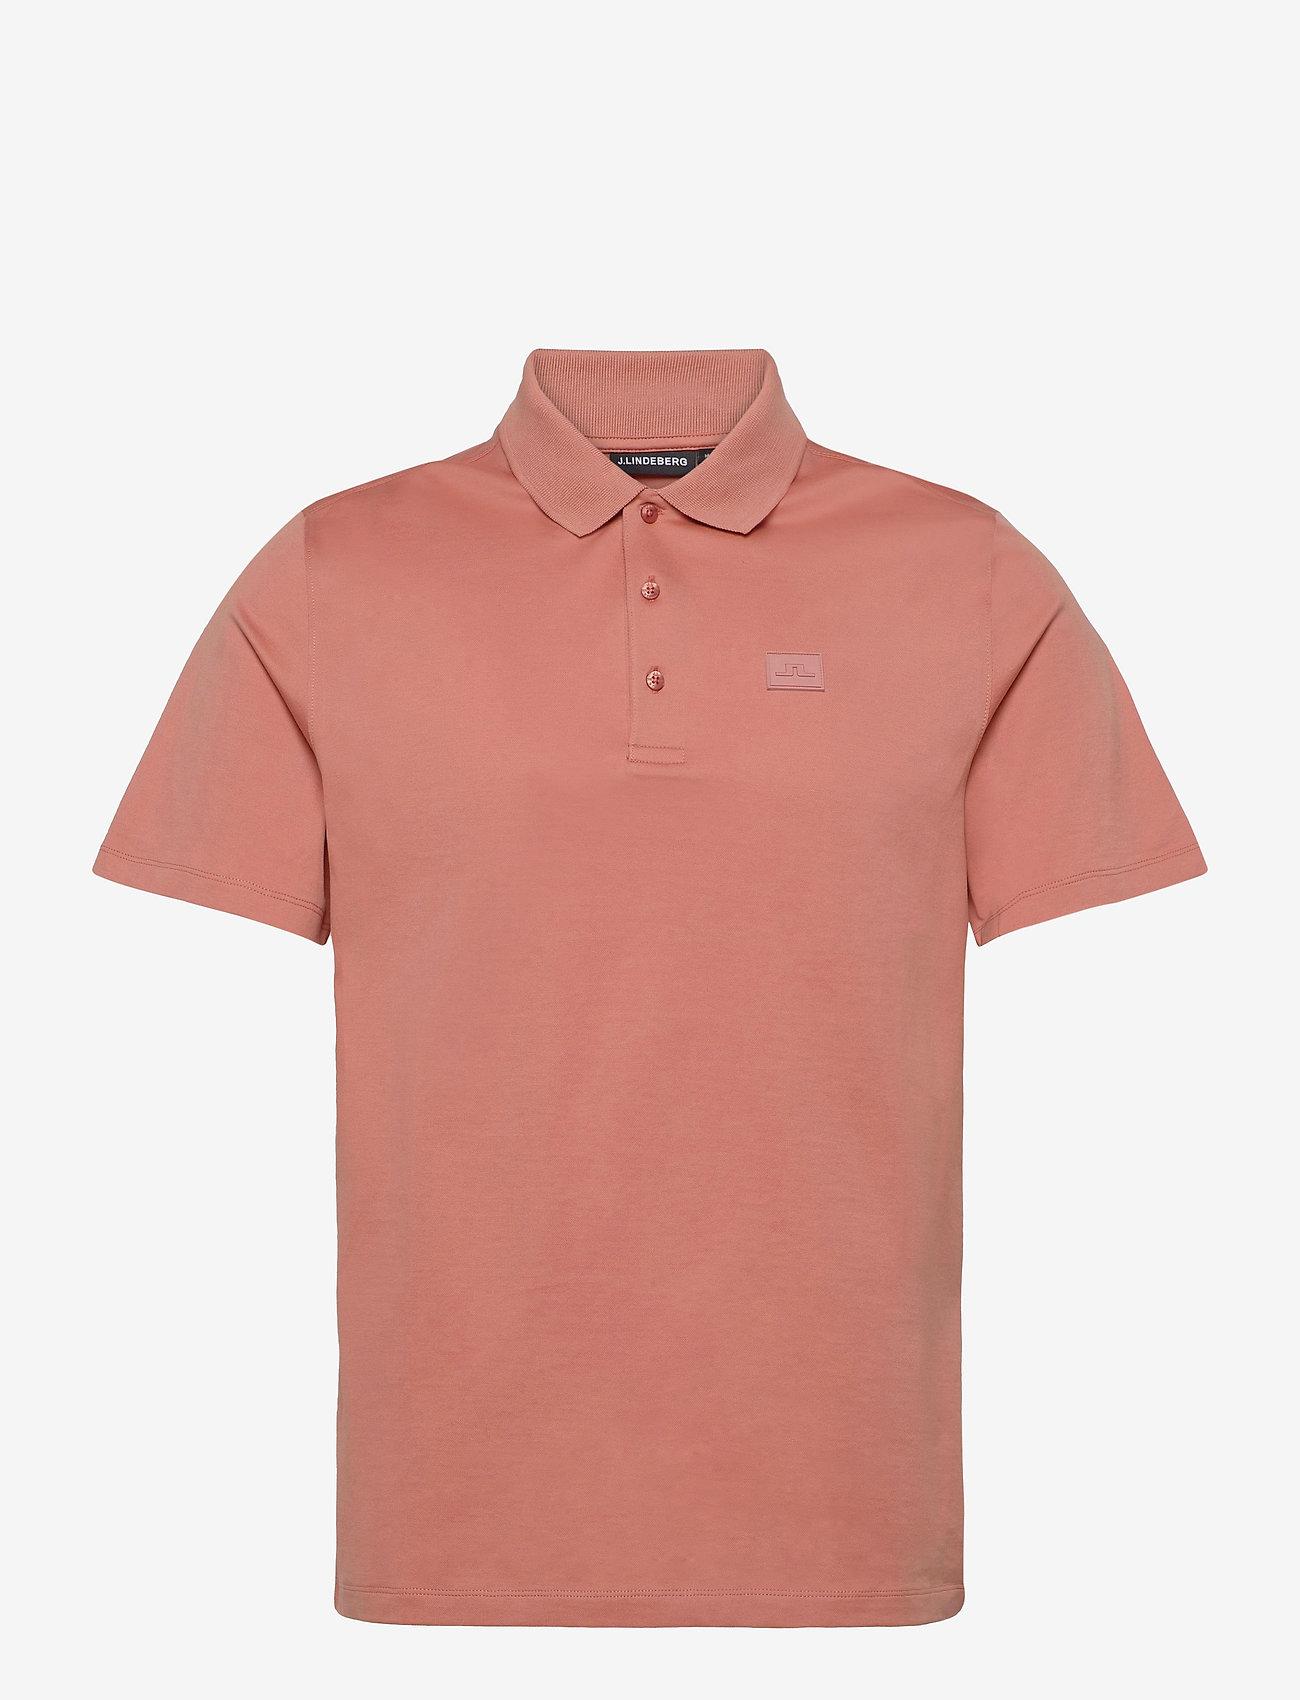 J. Lindeberg - Miles Jersey Polo Shirt - kurzärmelig - rose coppar - 1